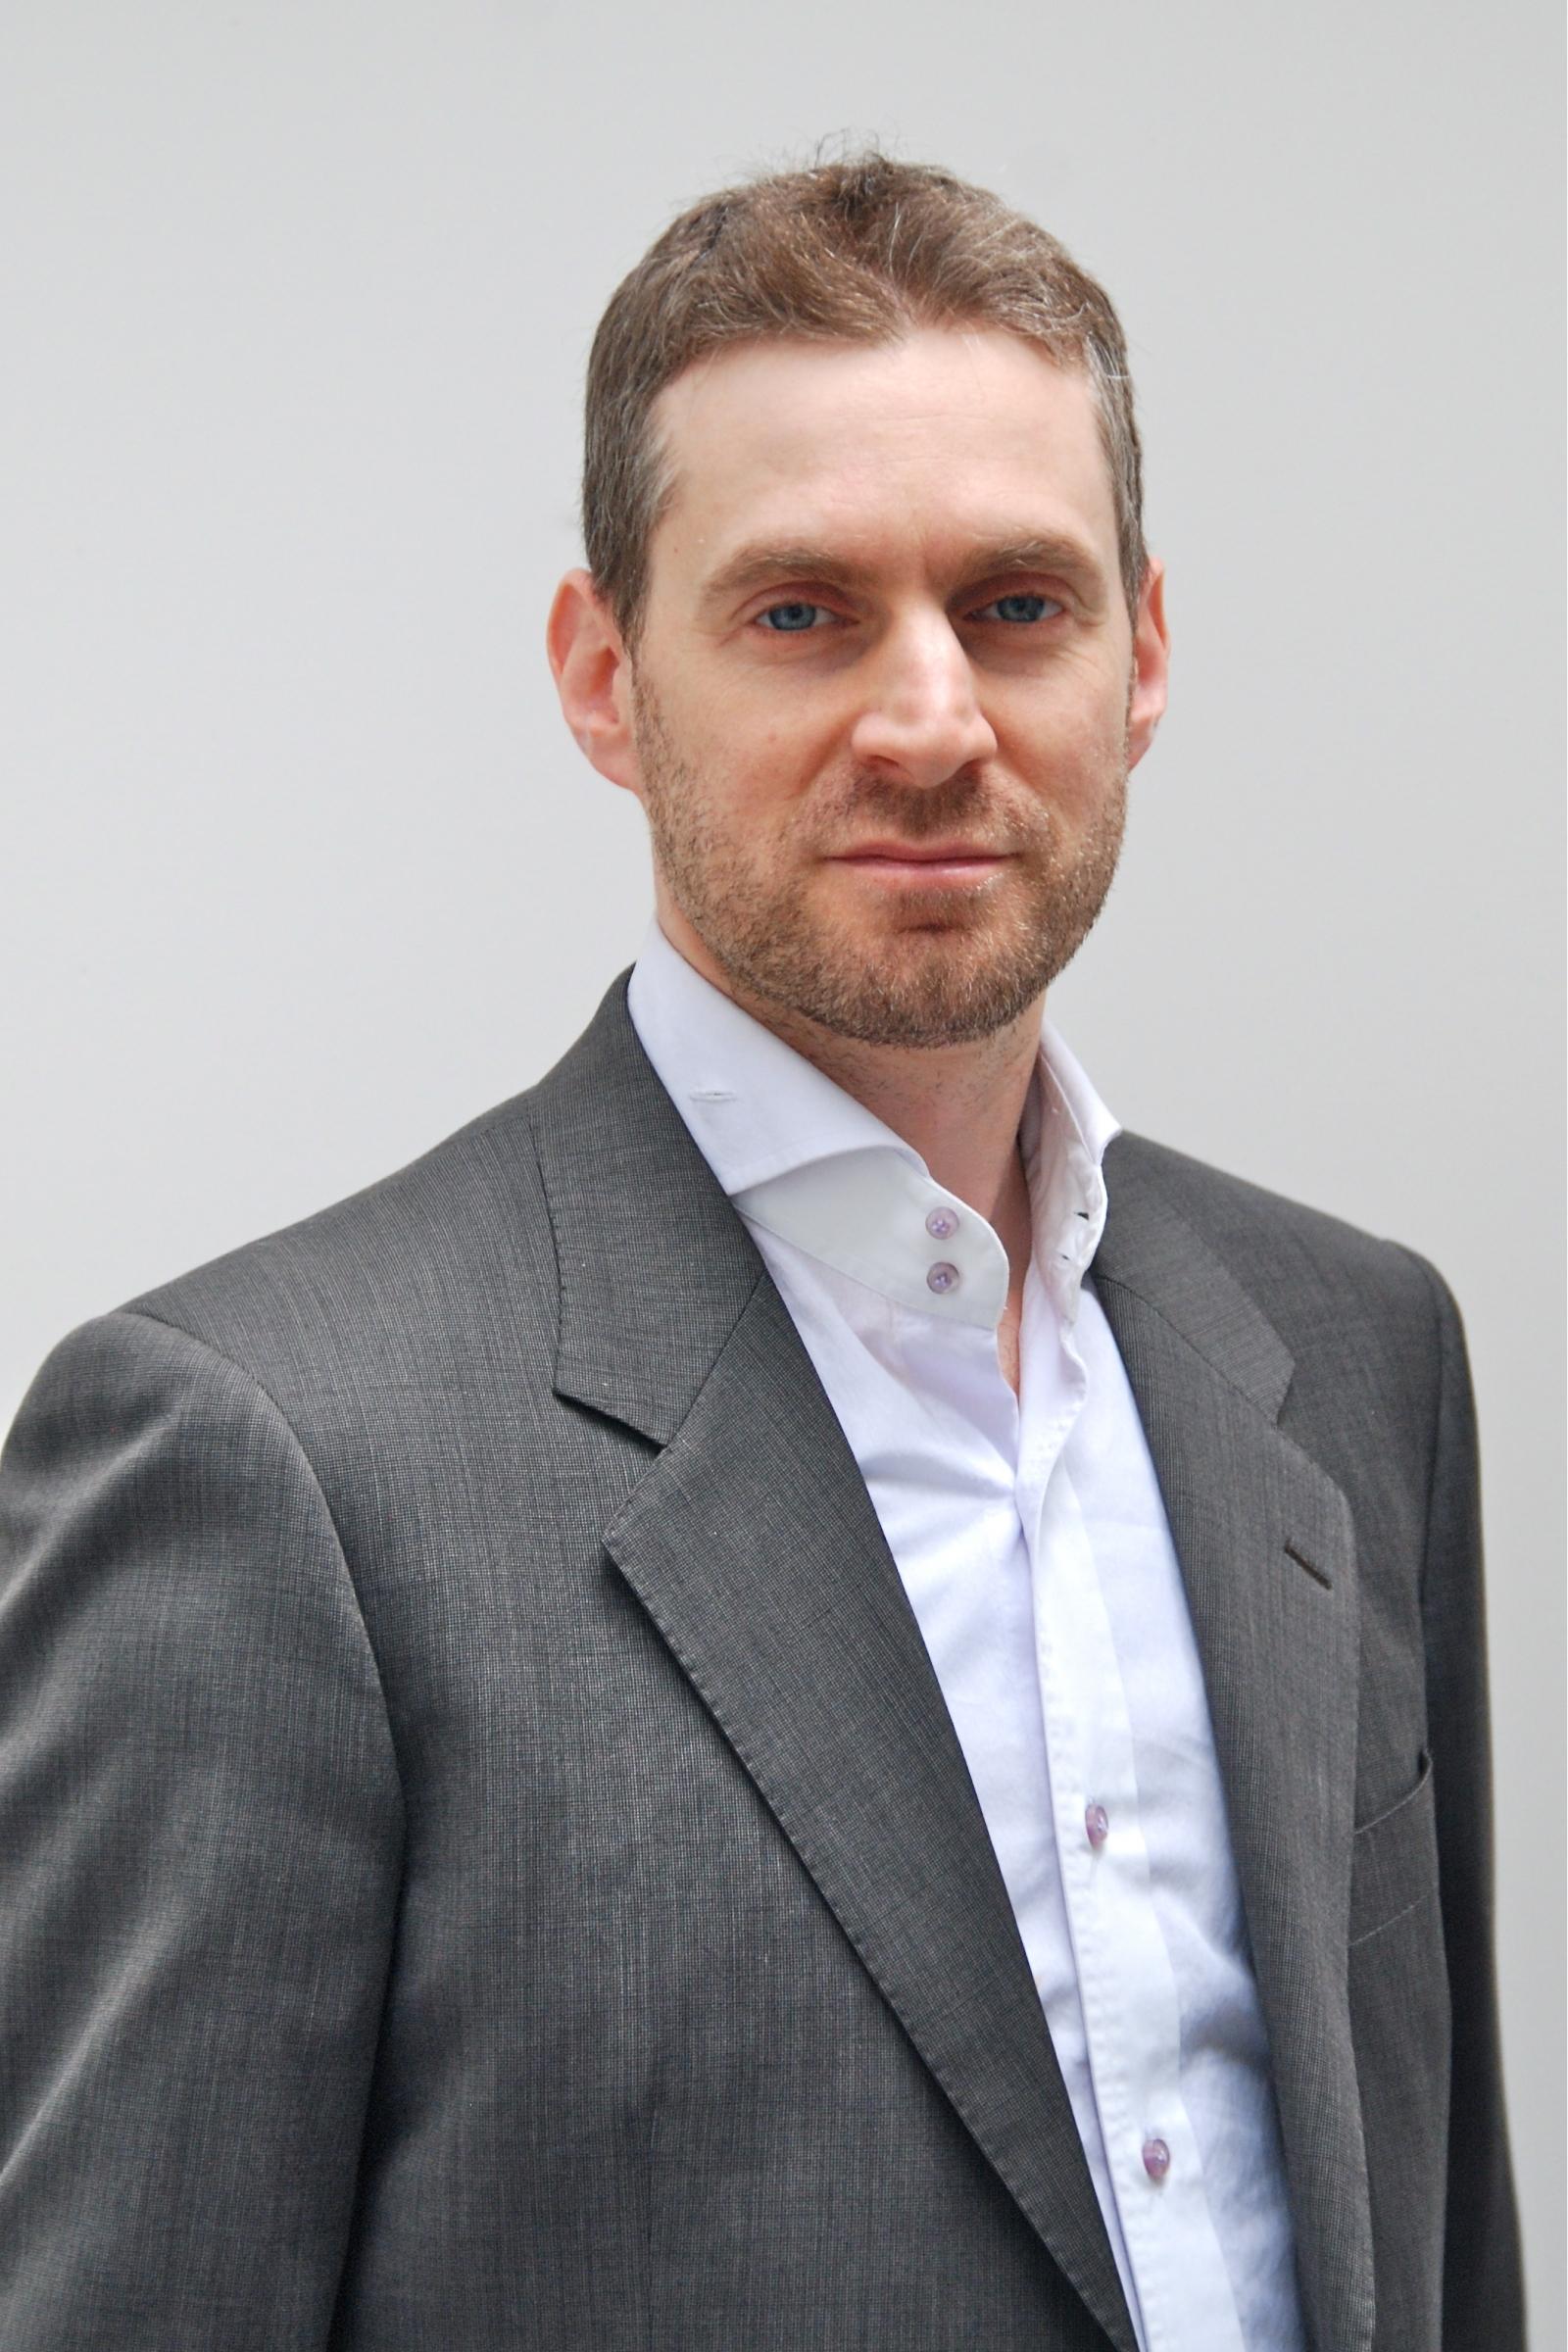 Marcus Weston